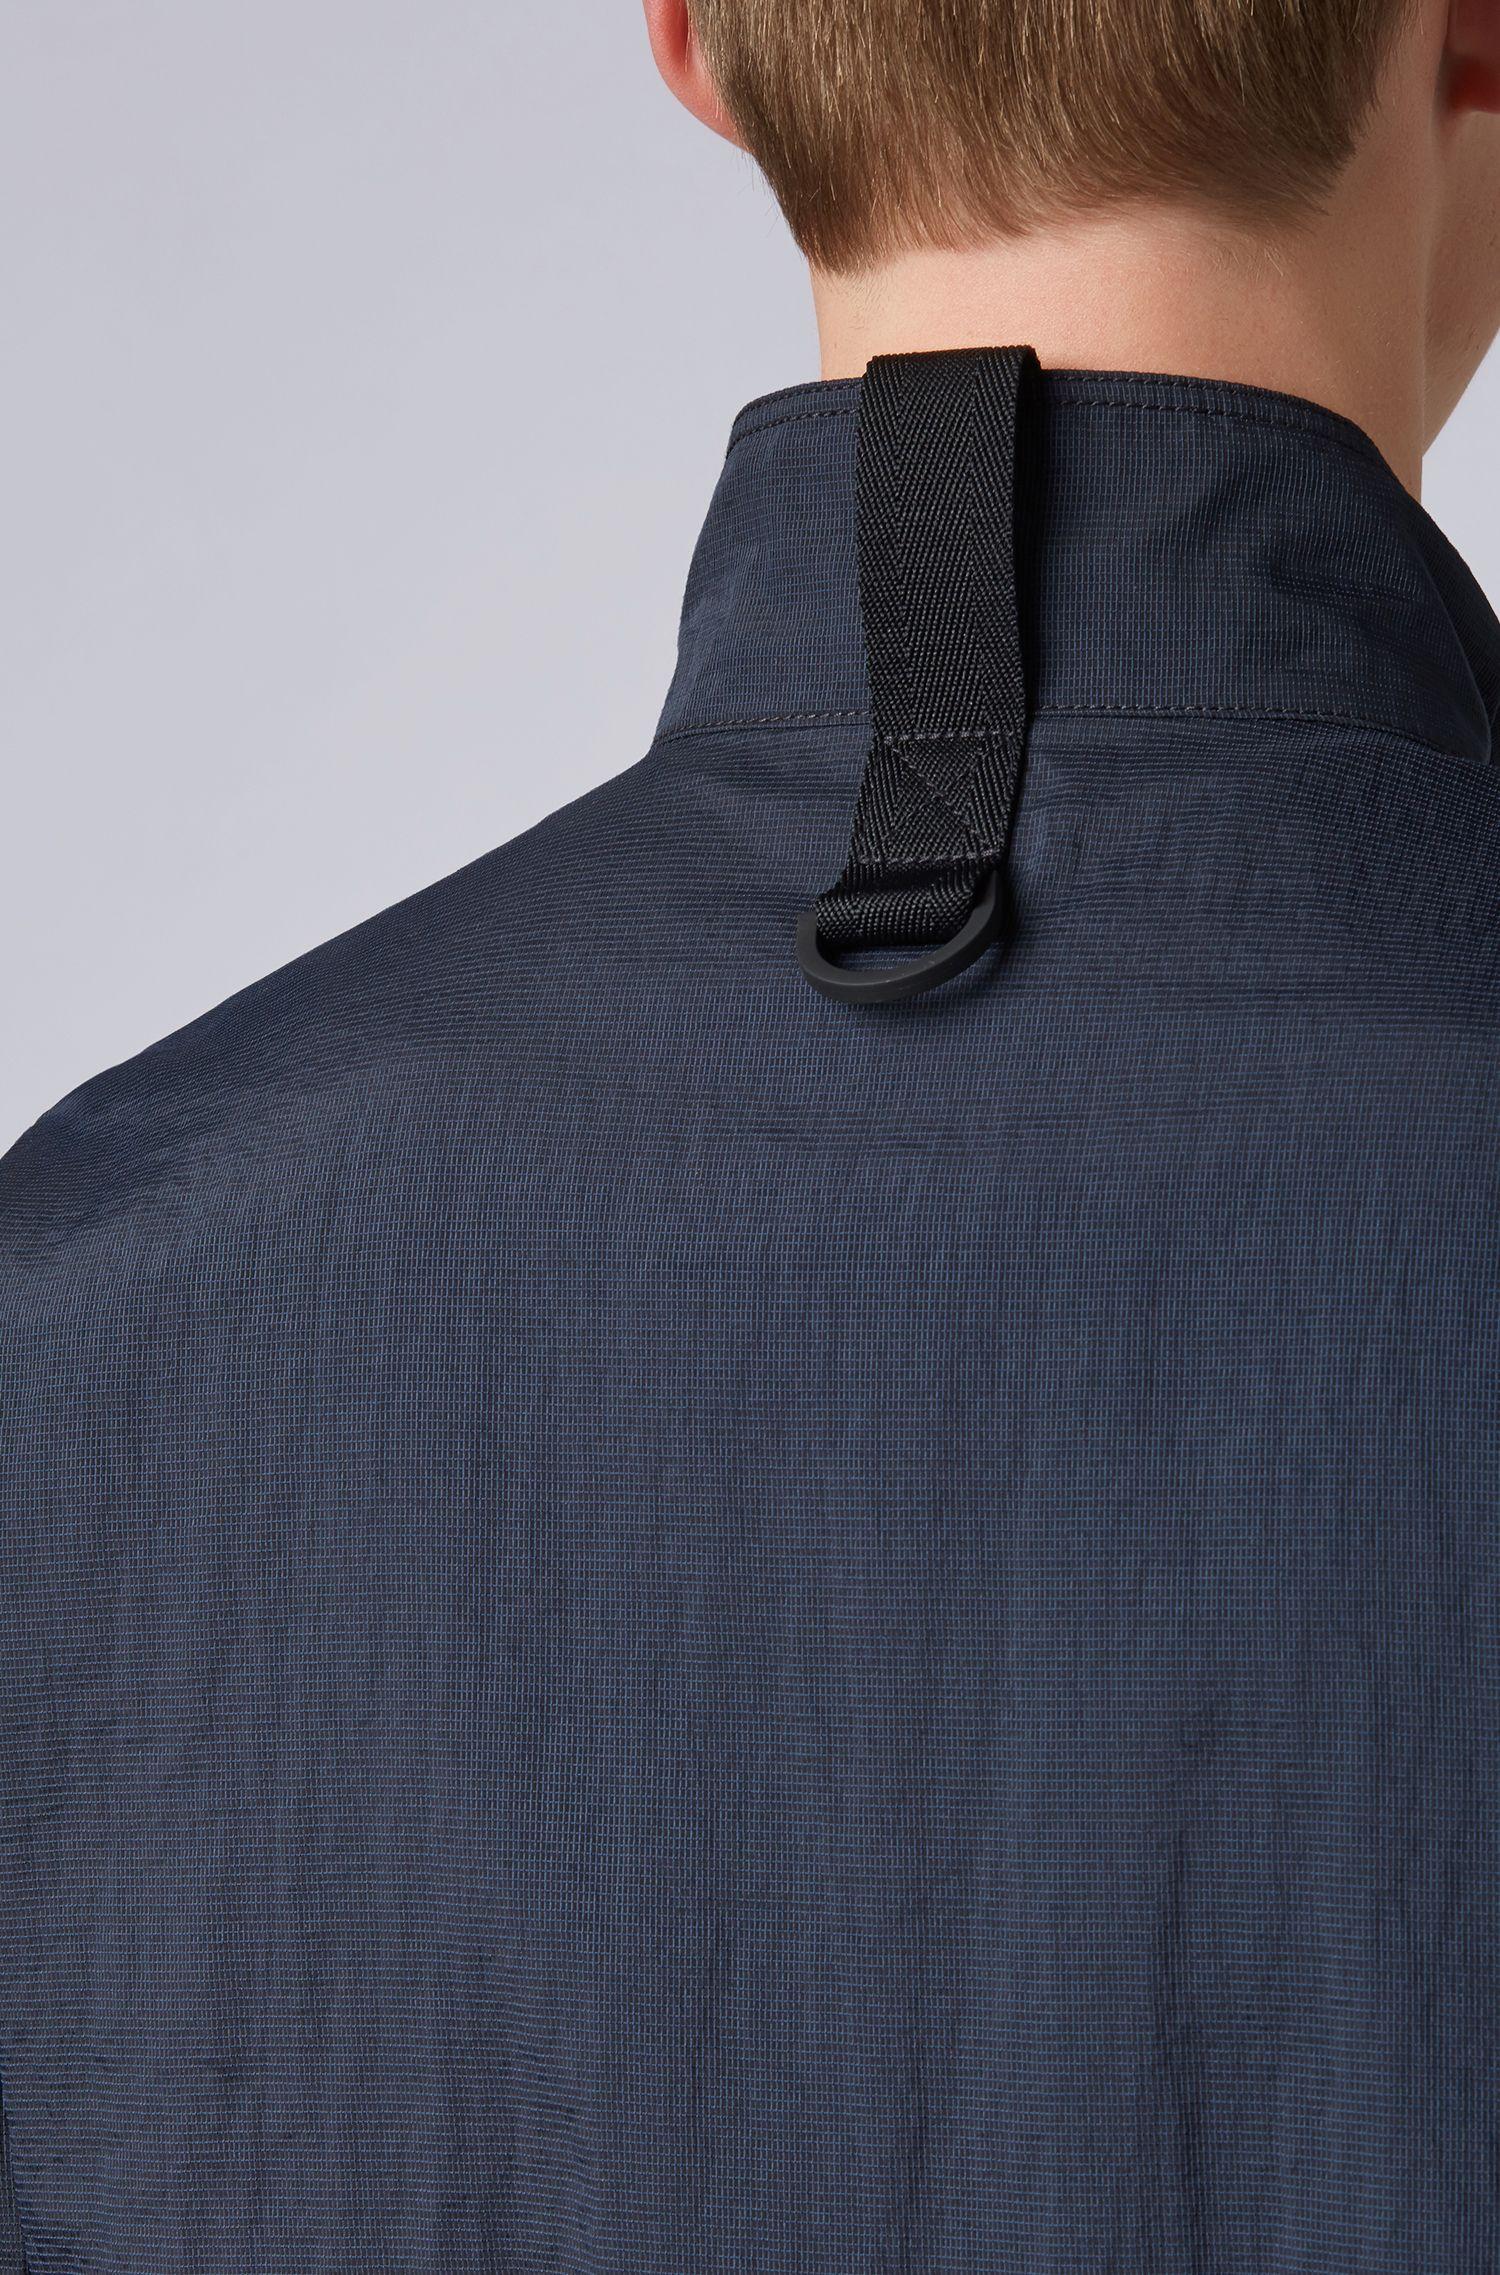 Waterafstotende jas van licht micro-meshmateriaal, Donkerblauw